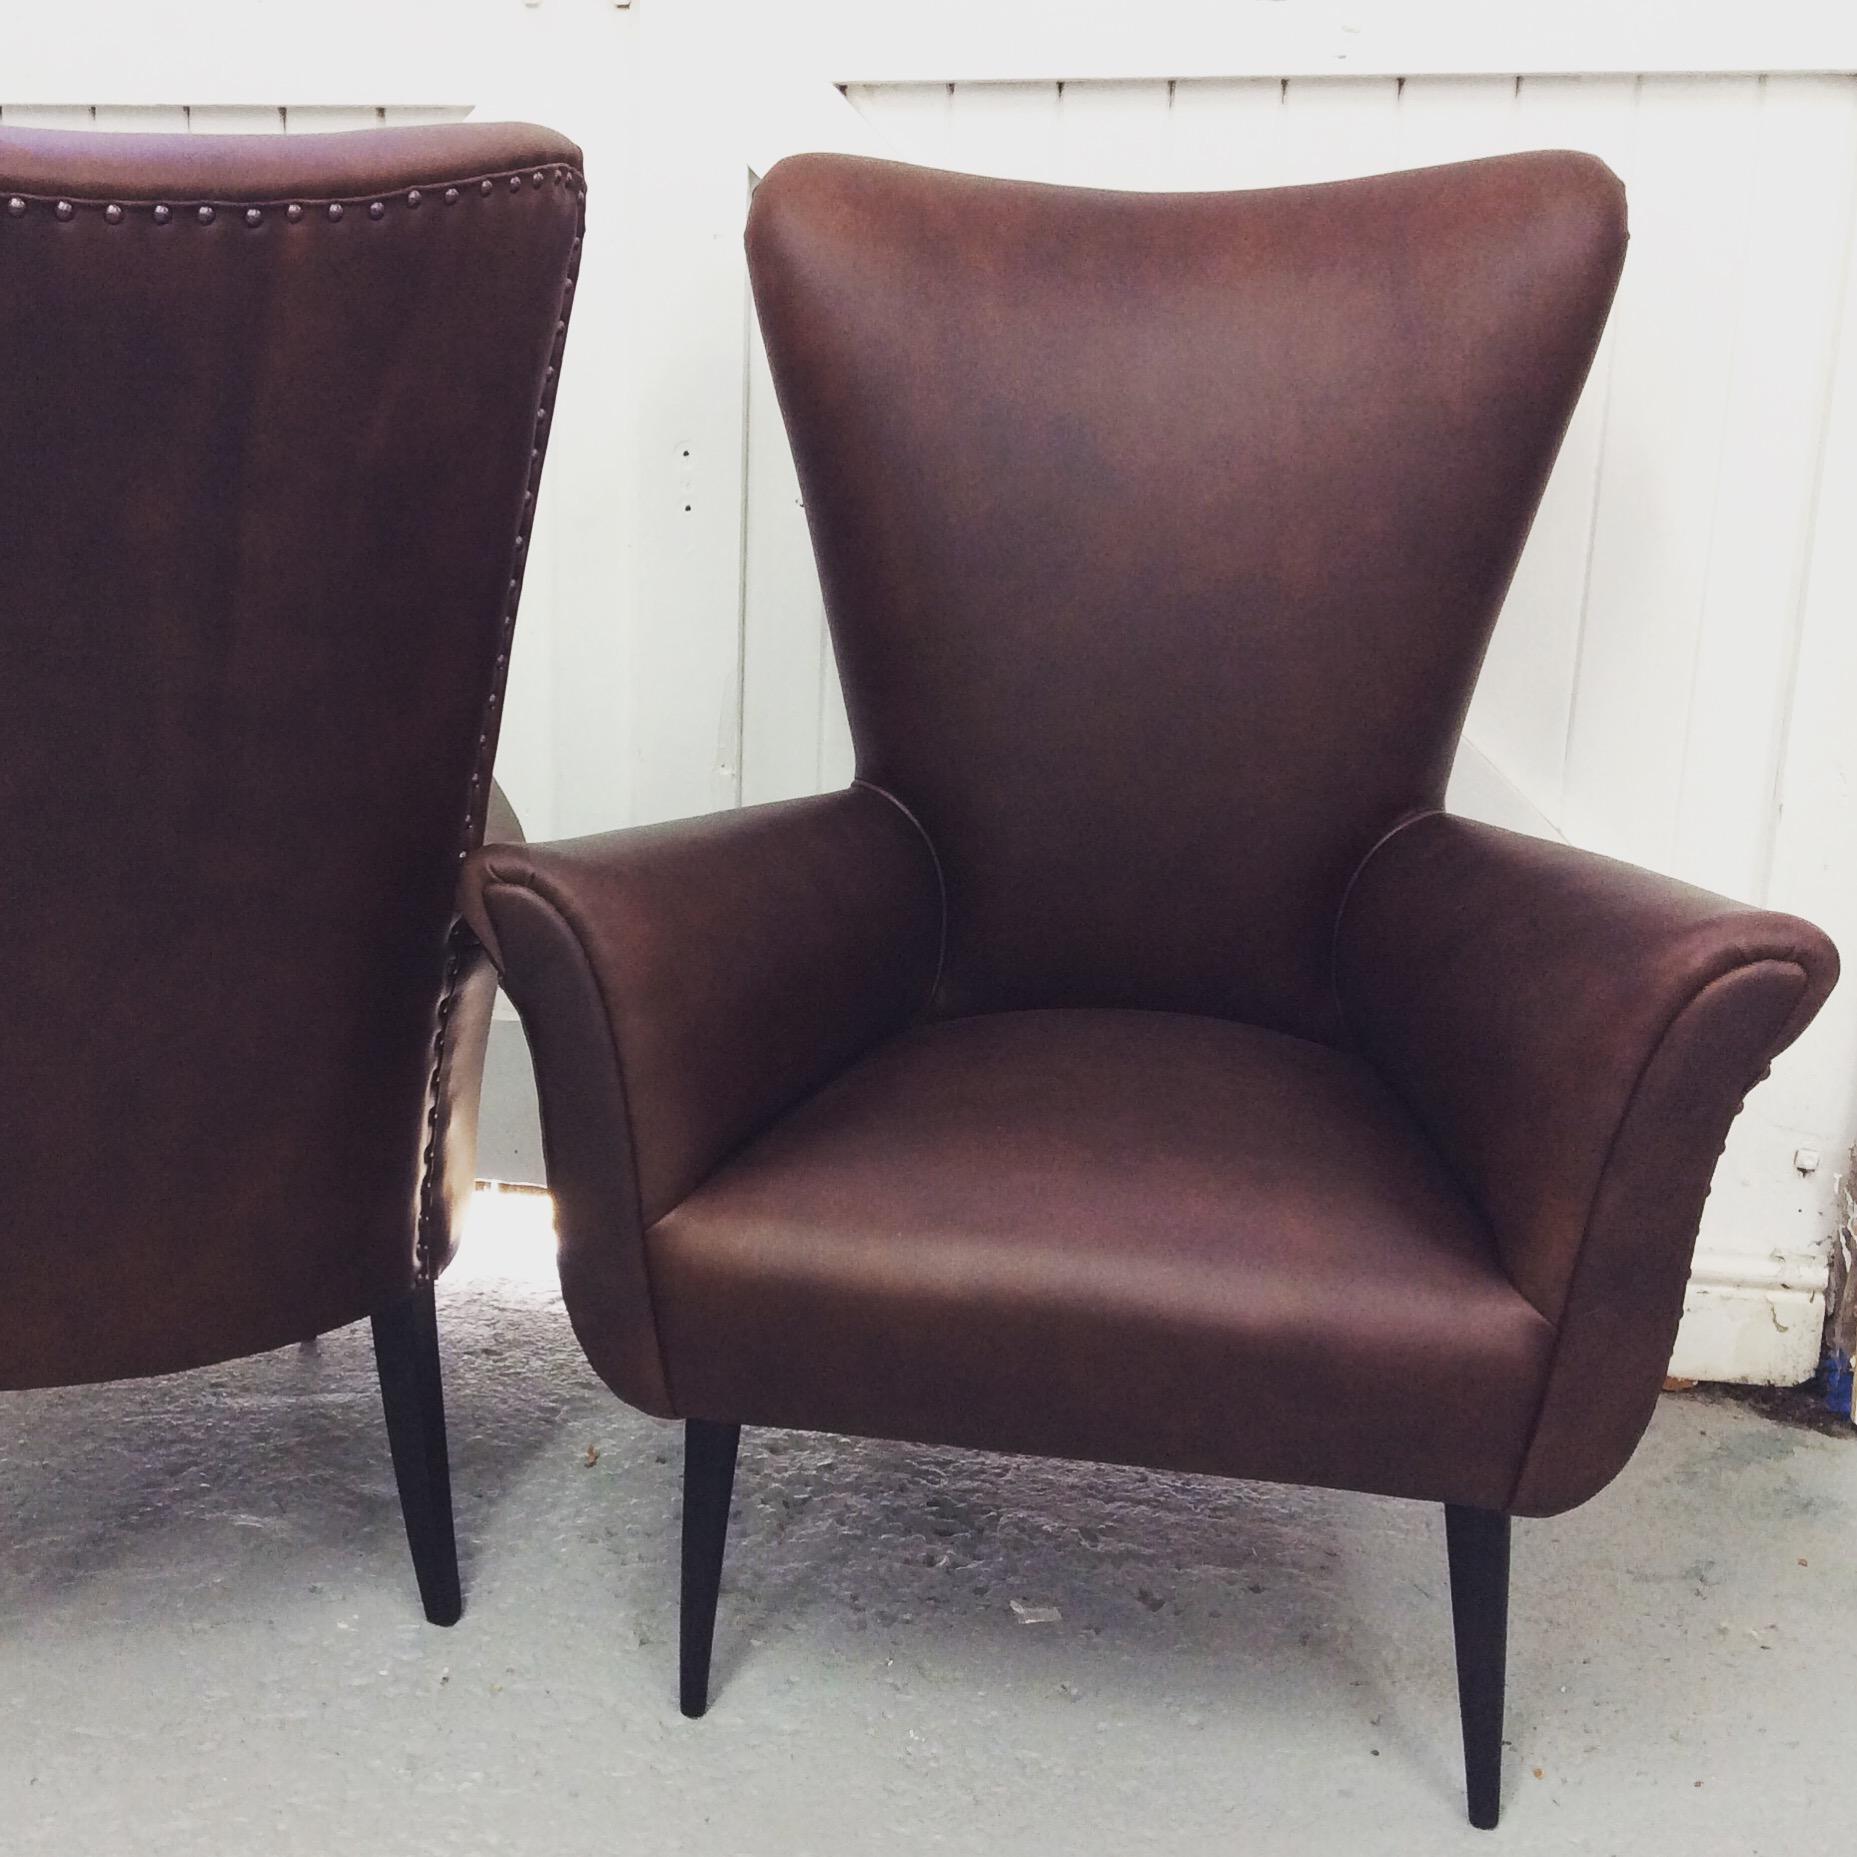 Leather chair.jpg